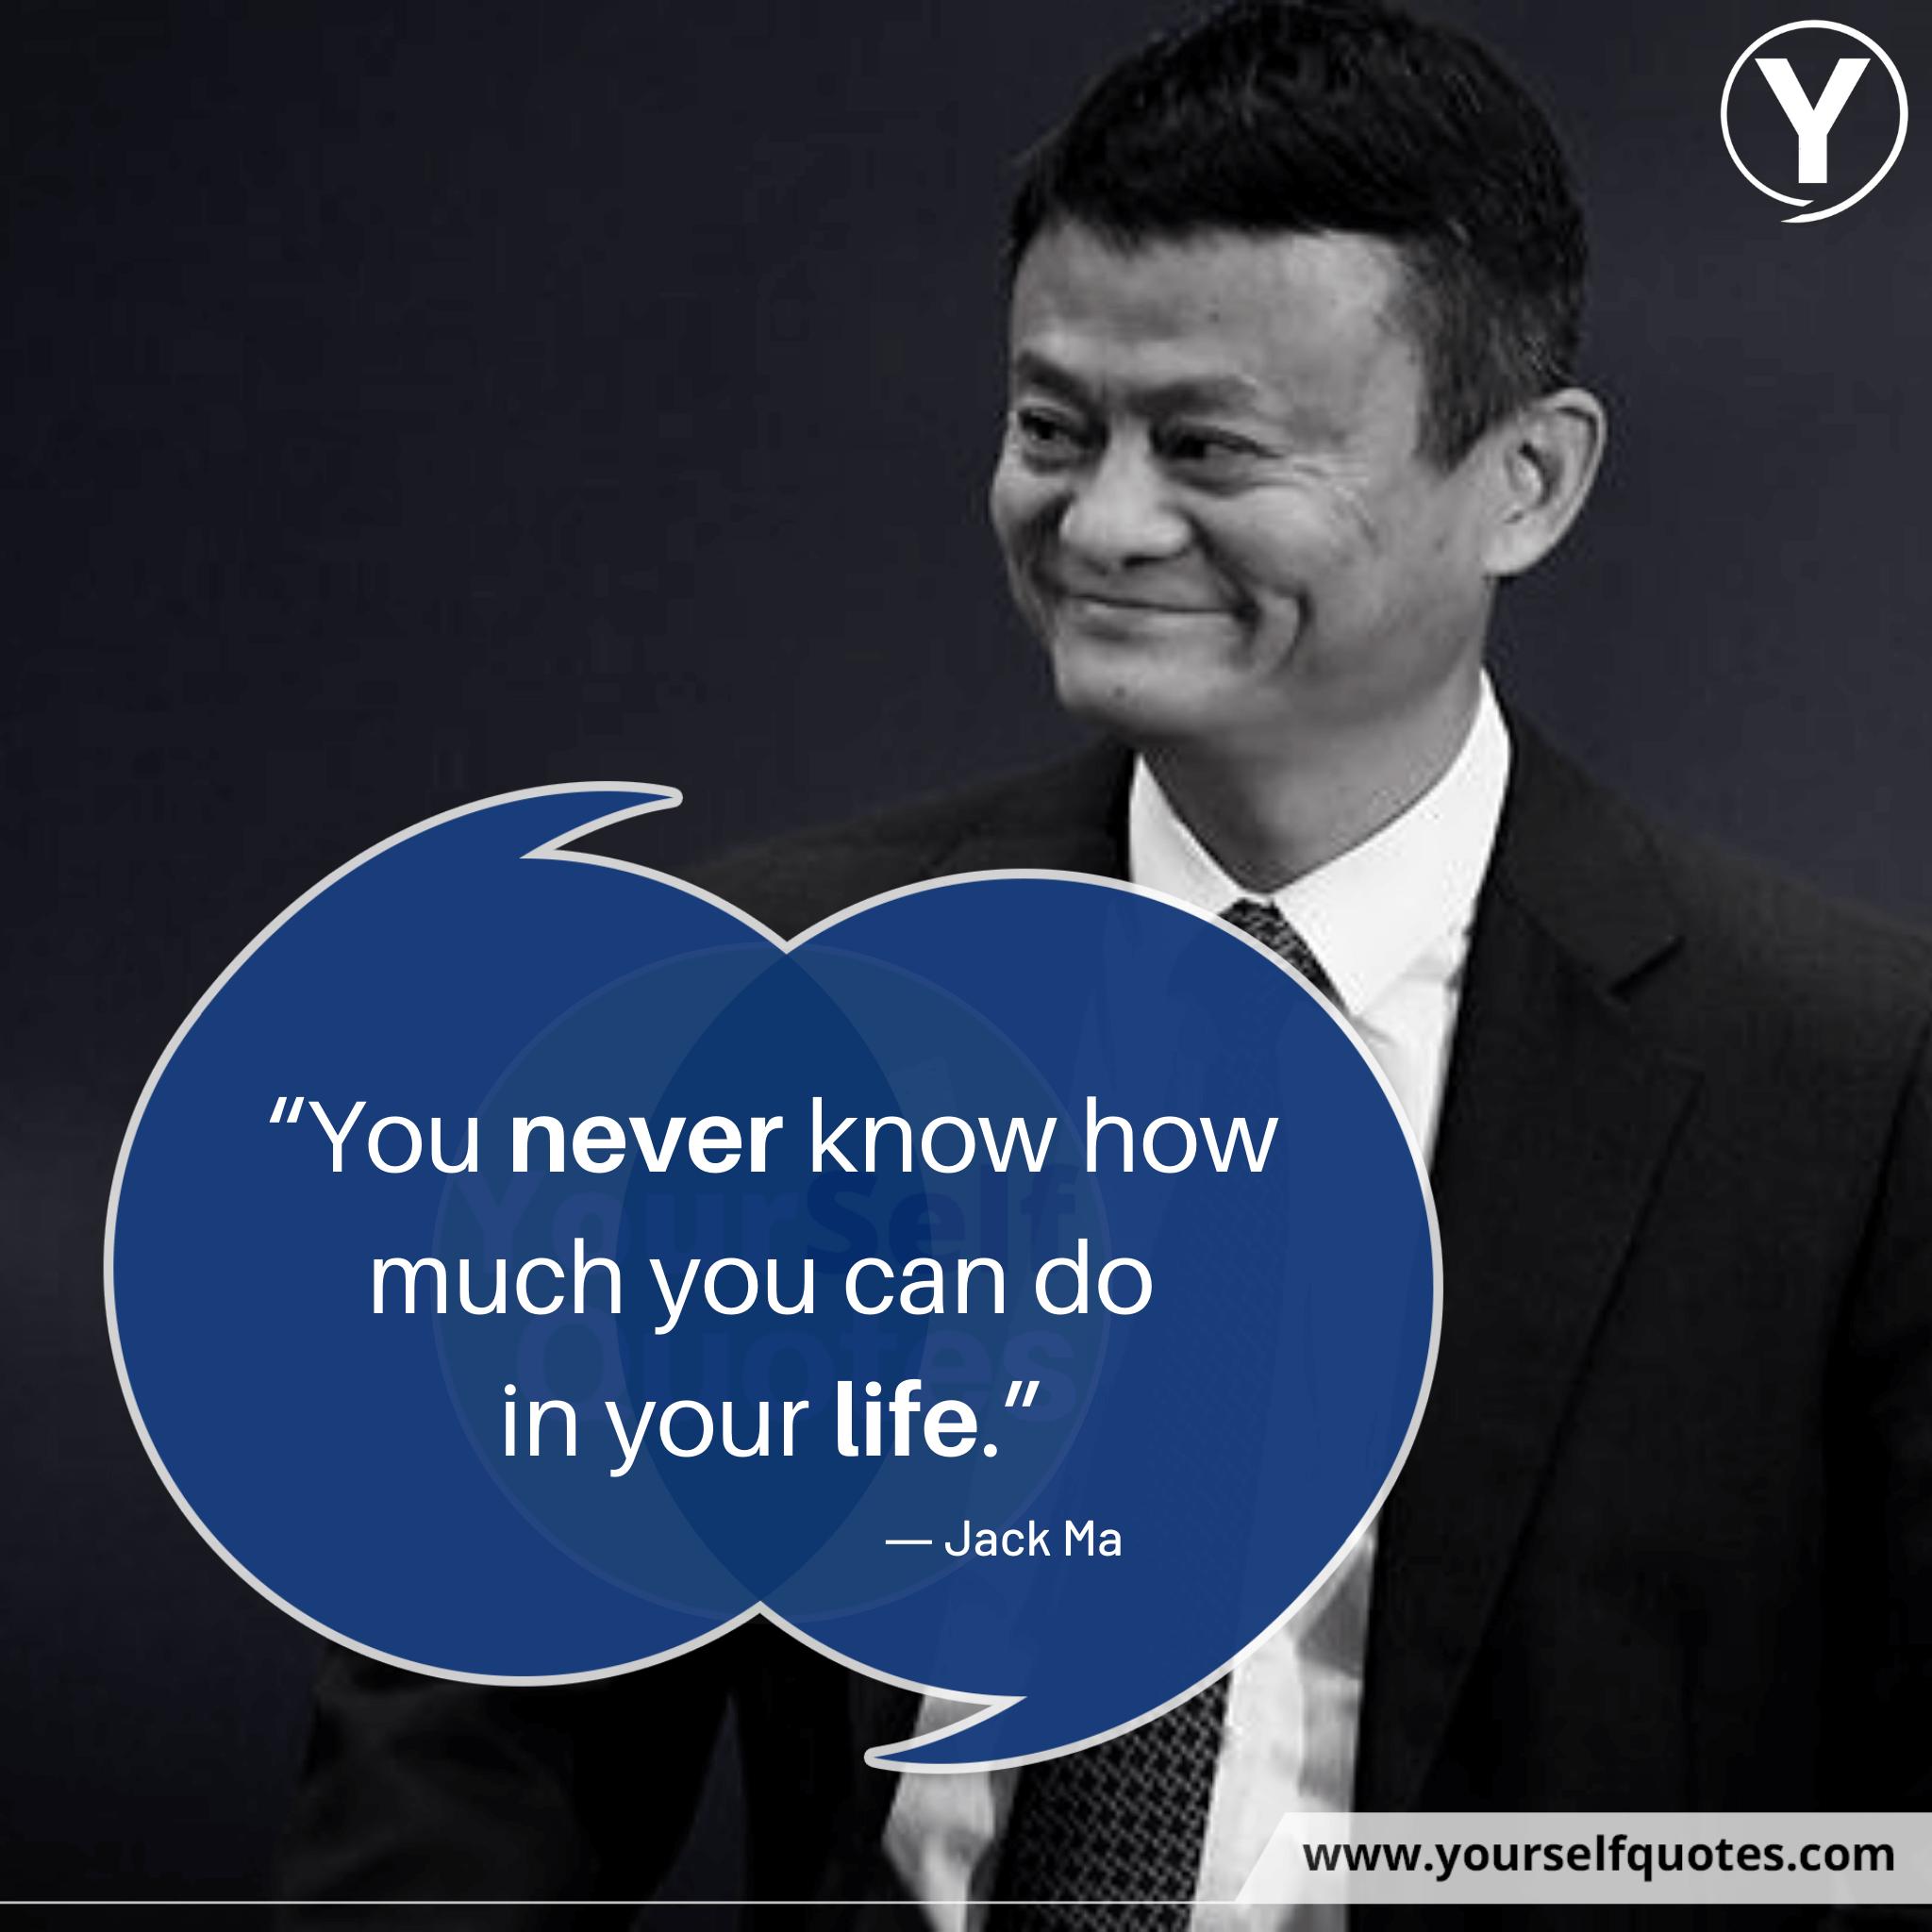 Kutipan Terbaik Jack Ma Life